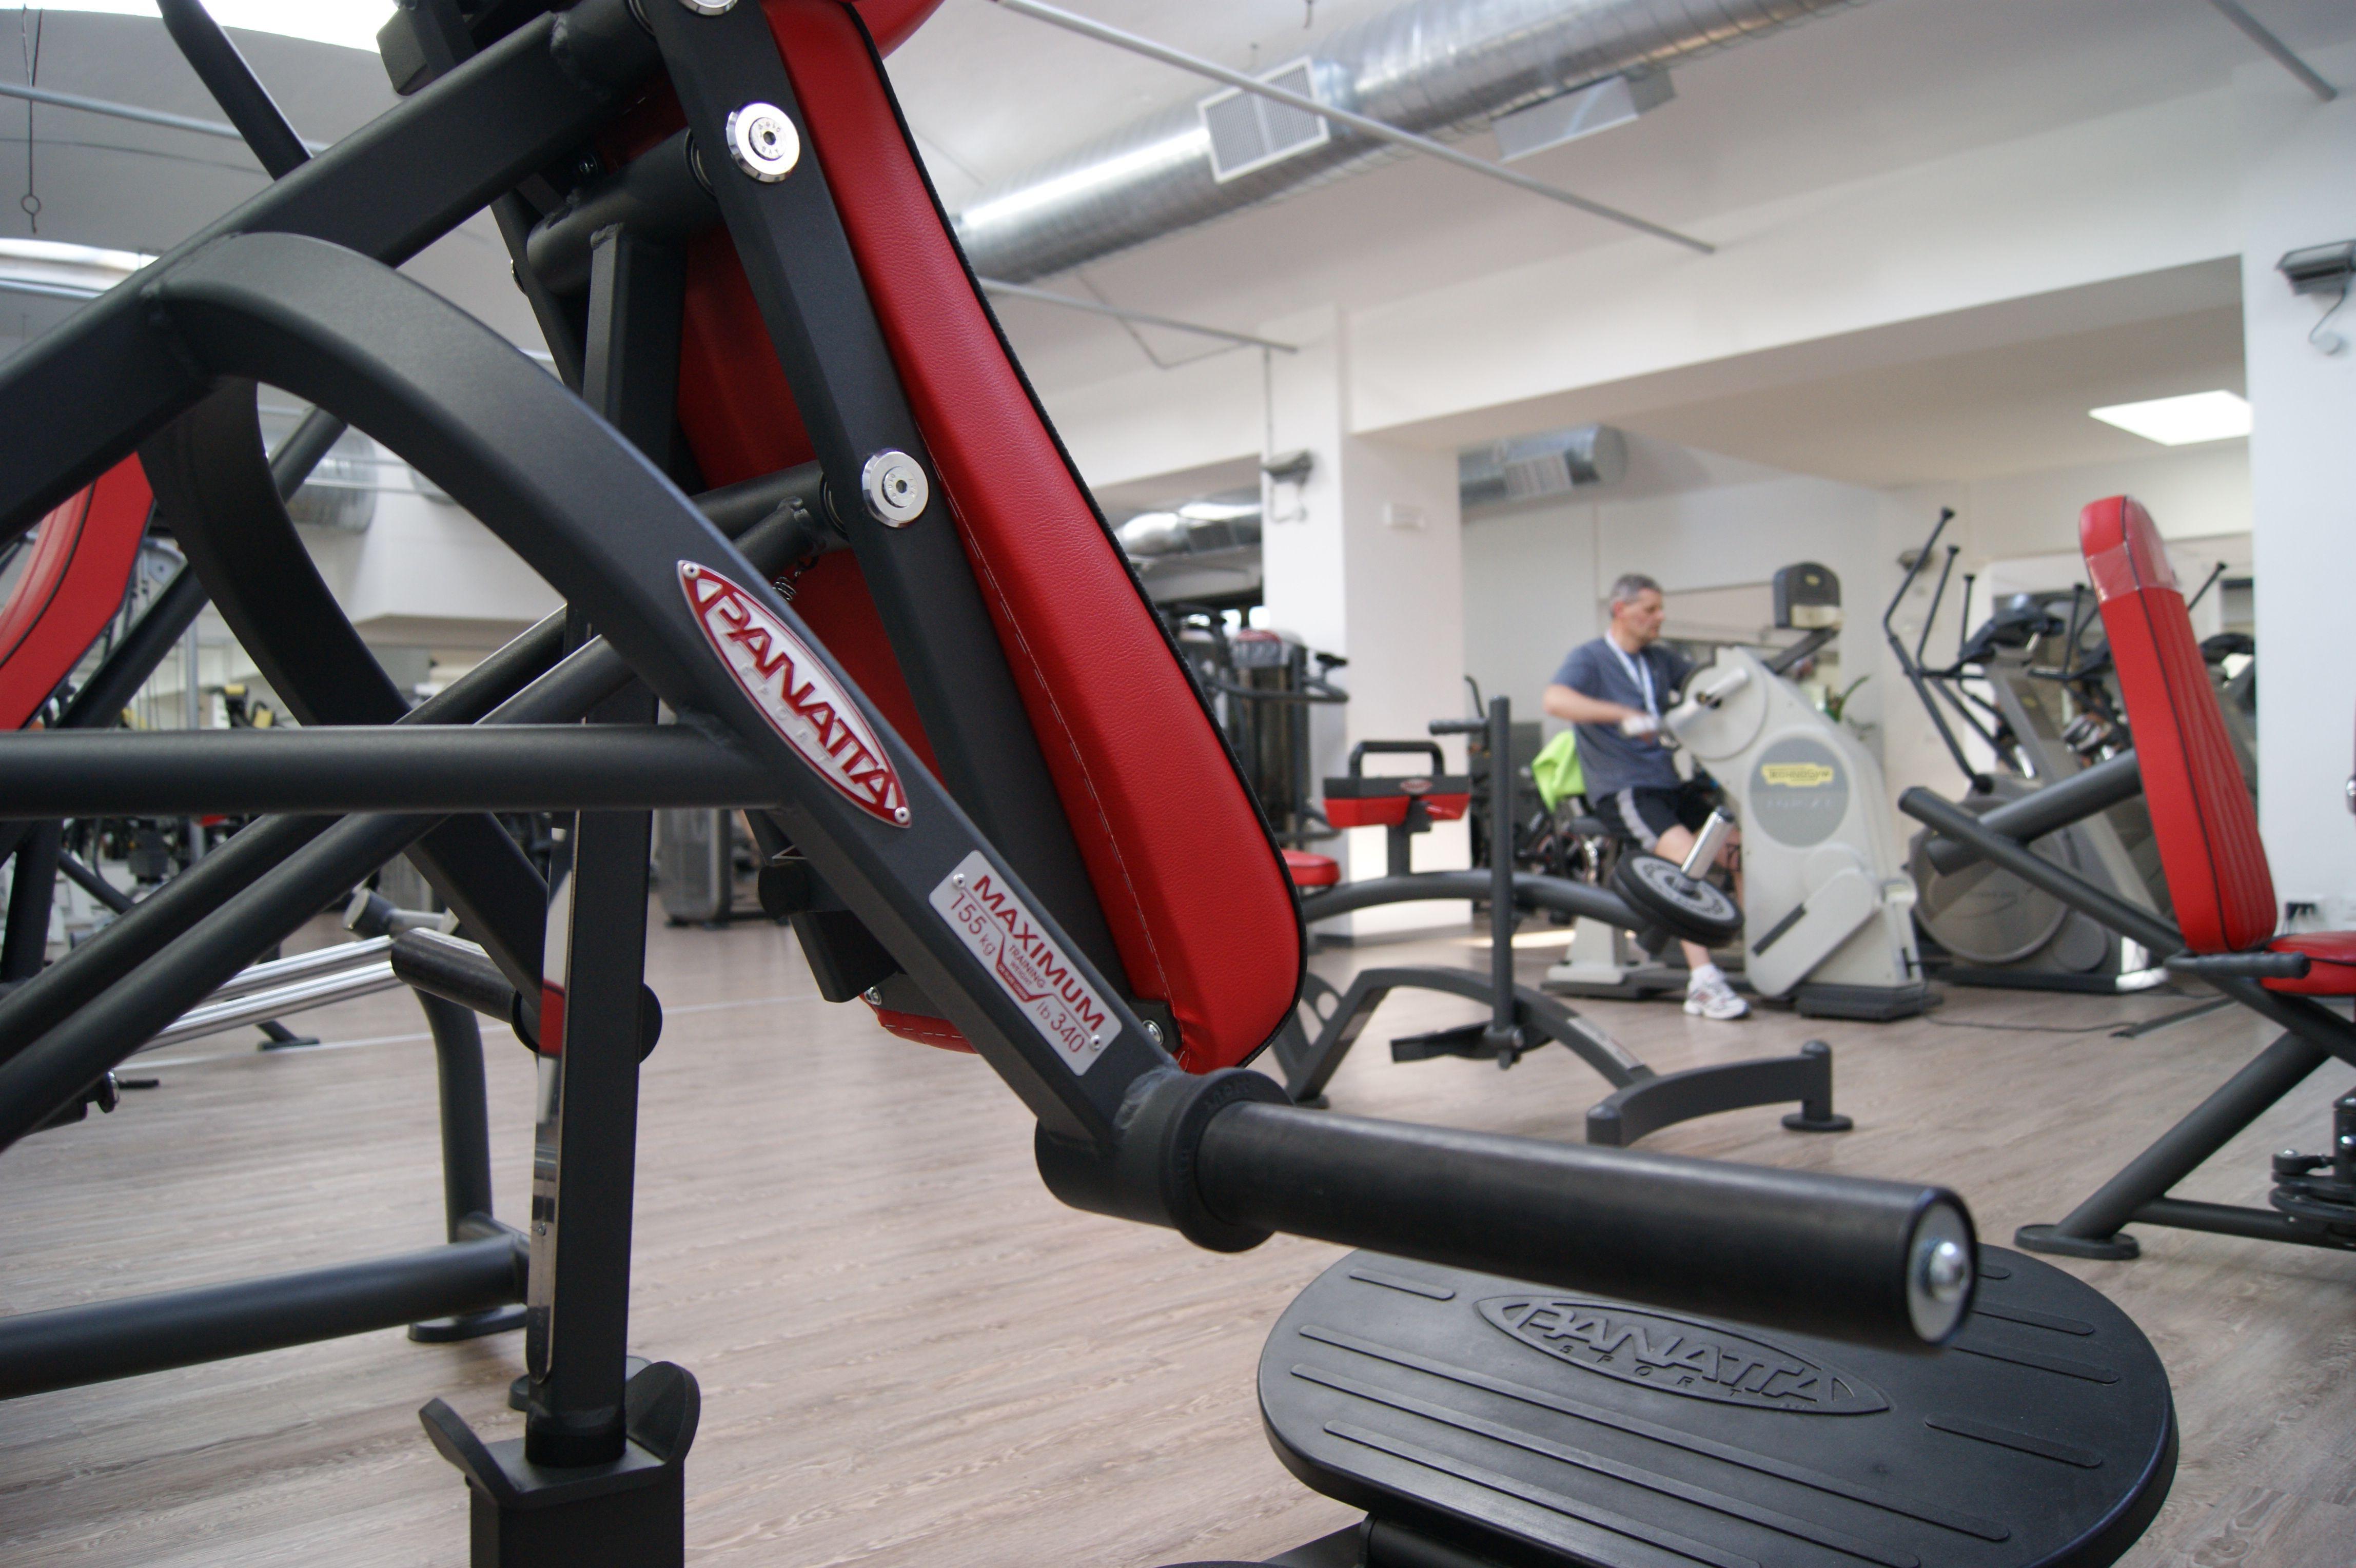 Cose Di Casa Carate macchina power squat panatta palestra easy life fitness di